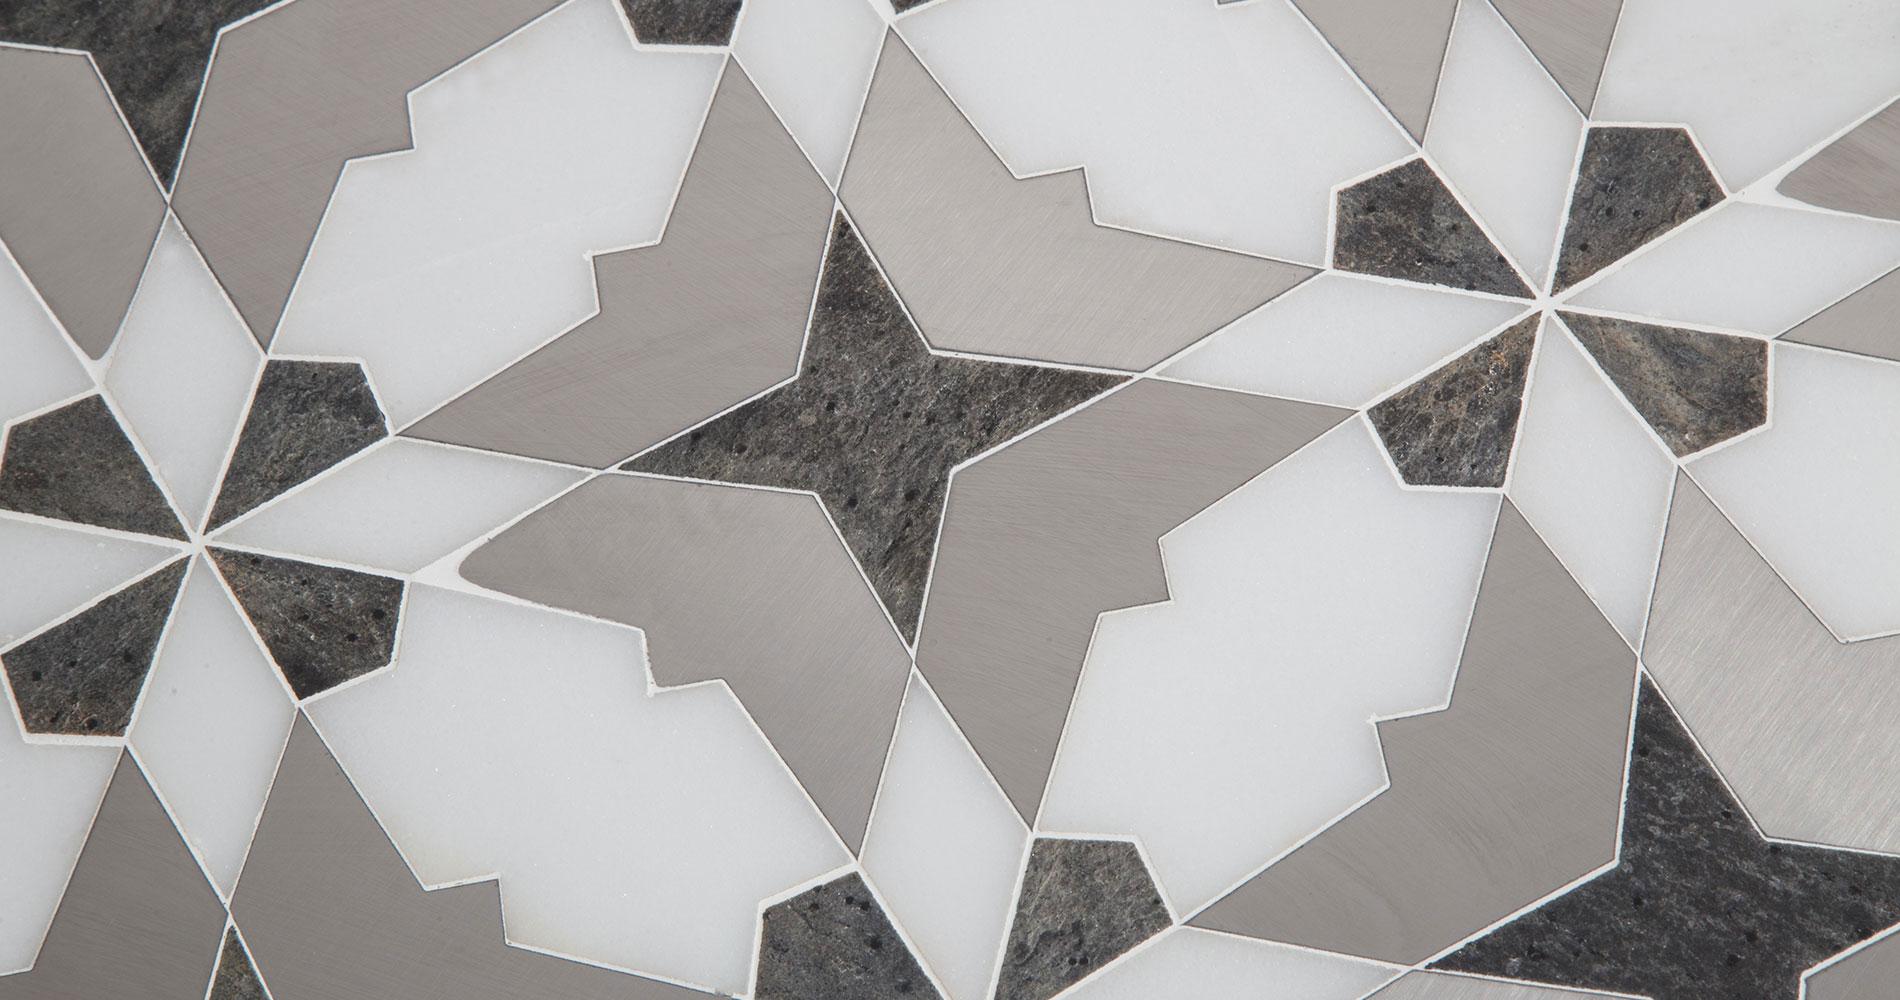 centurymosaic-Dialectics-Water-Jet-Mosaic-Tile-Collection